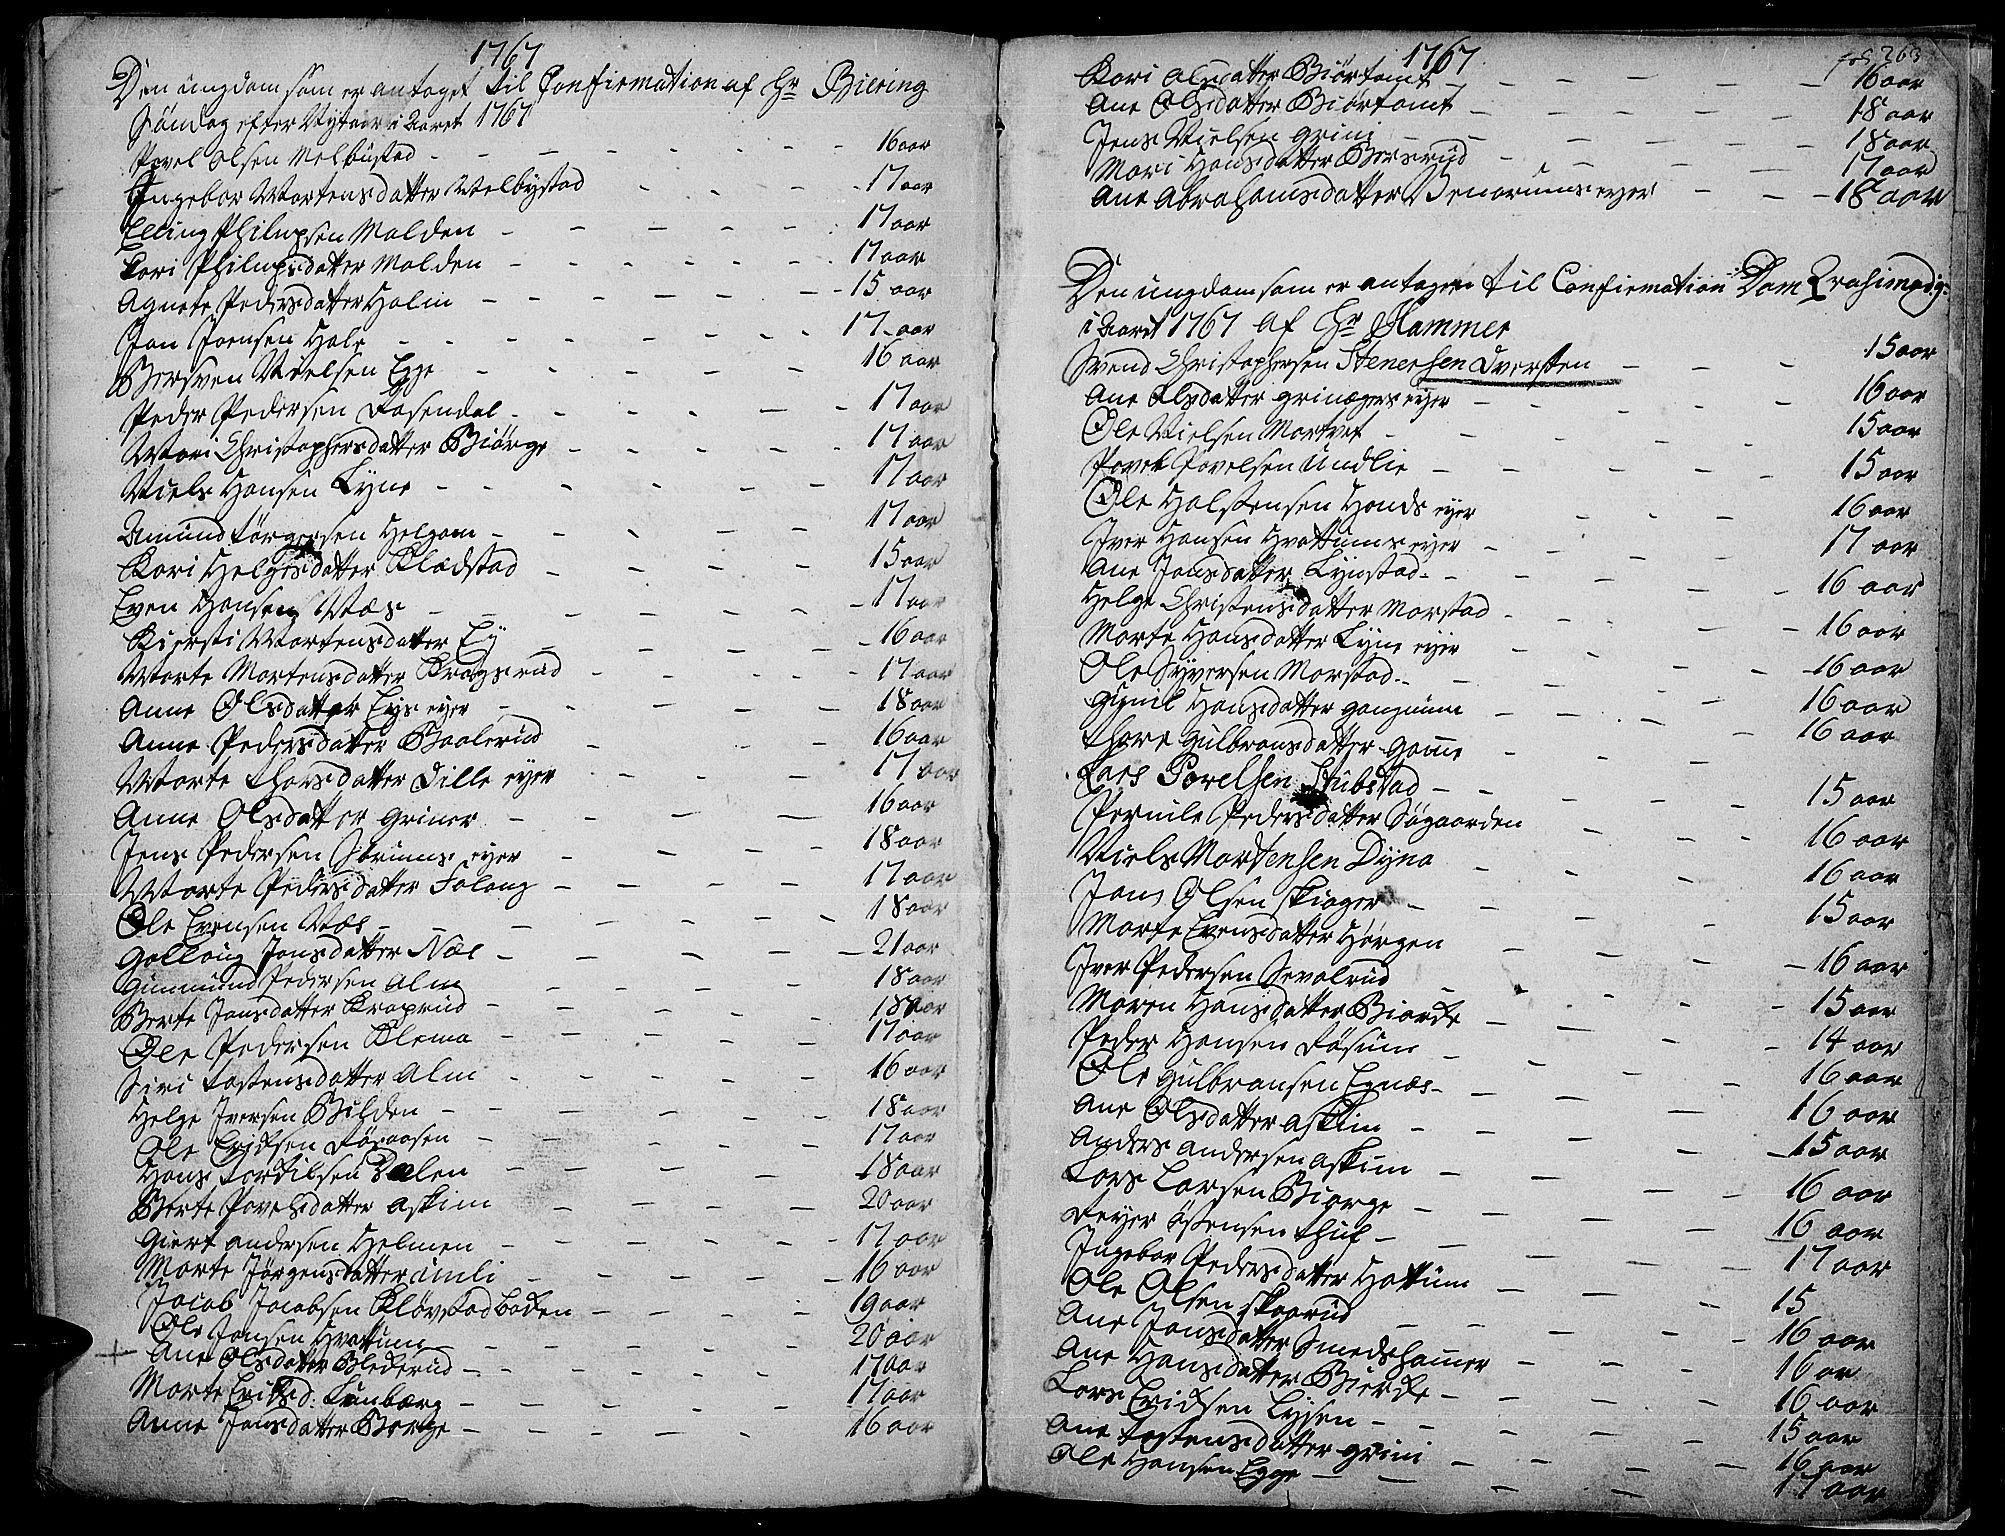 SAH, Gran prestekontor, Ministerialbok nr. 4, 1759-1775, s. 263